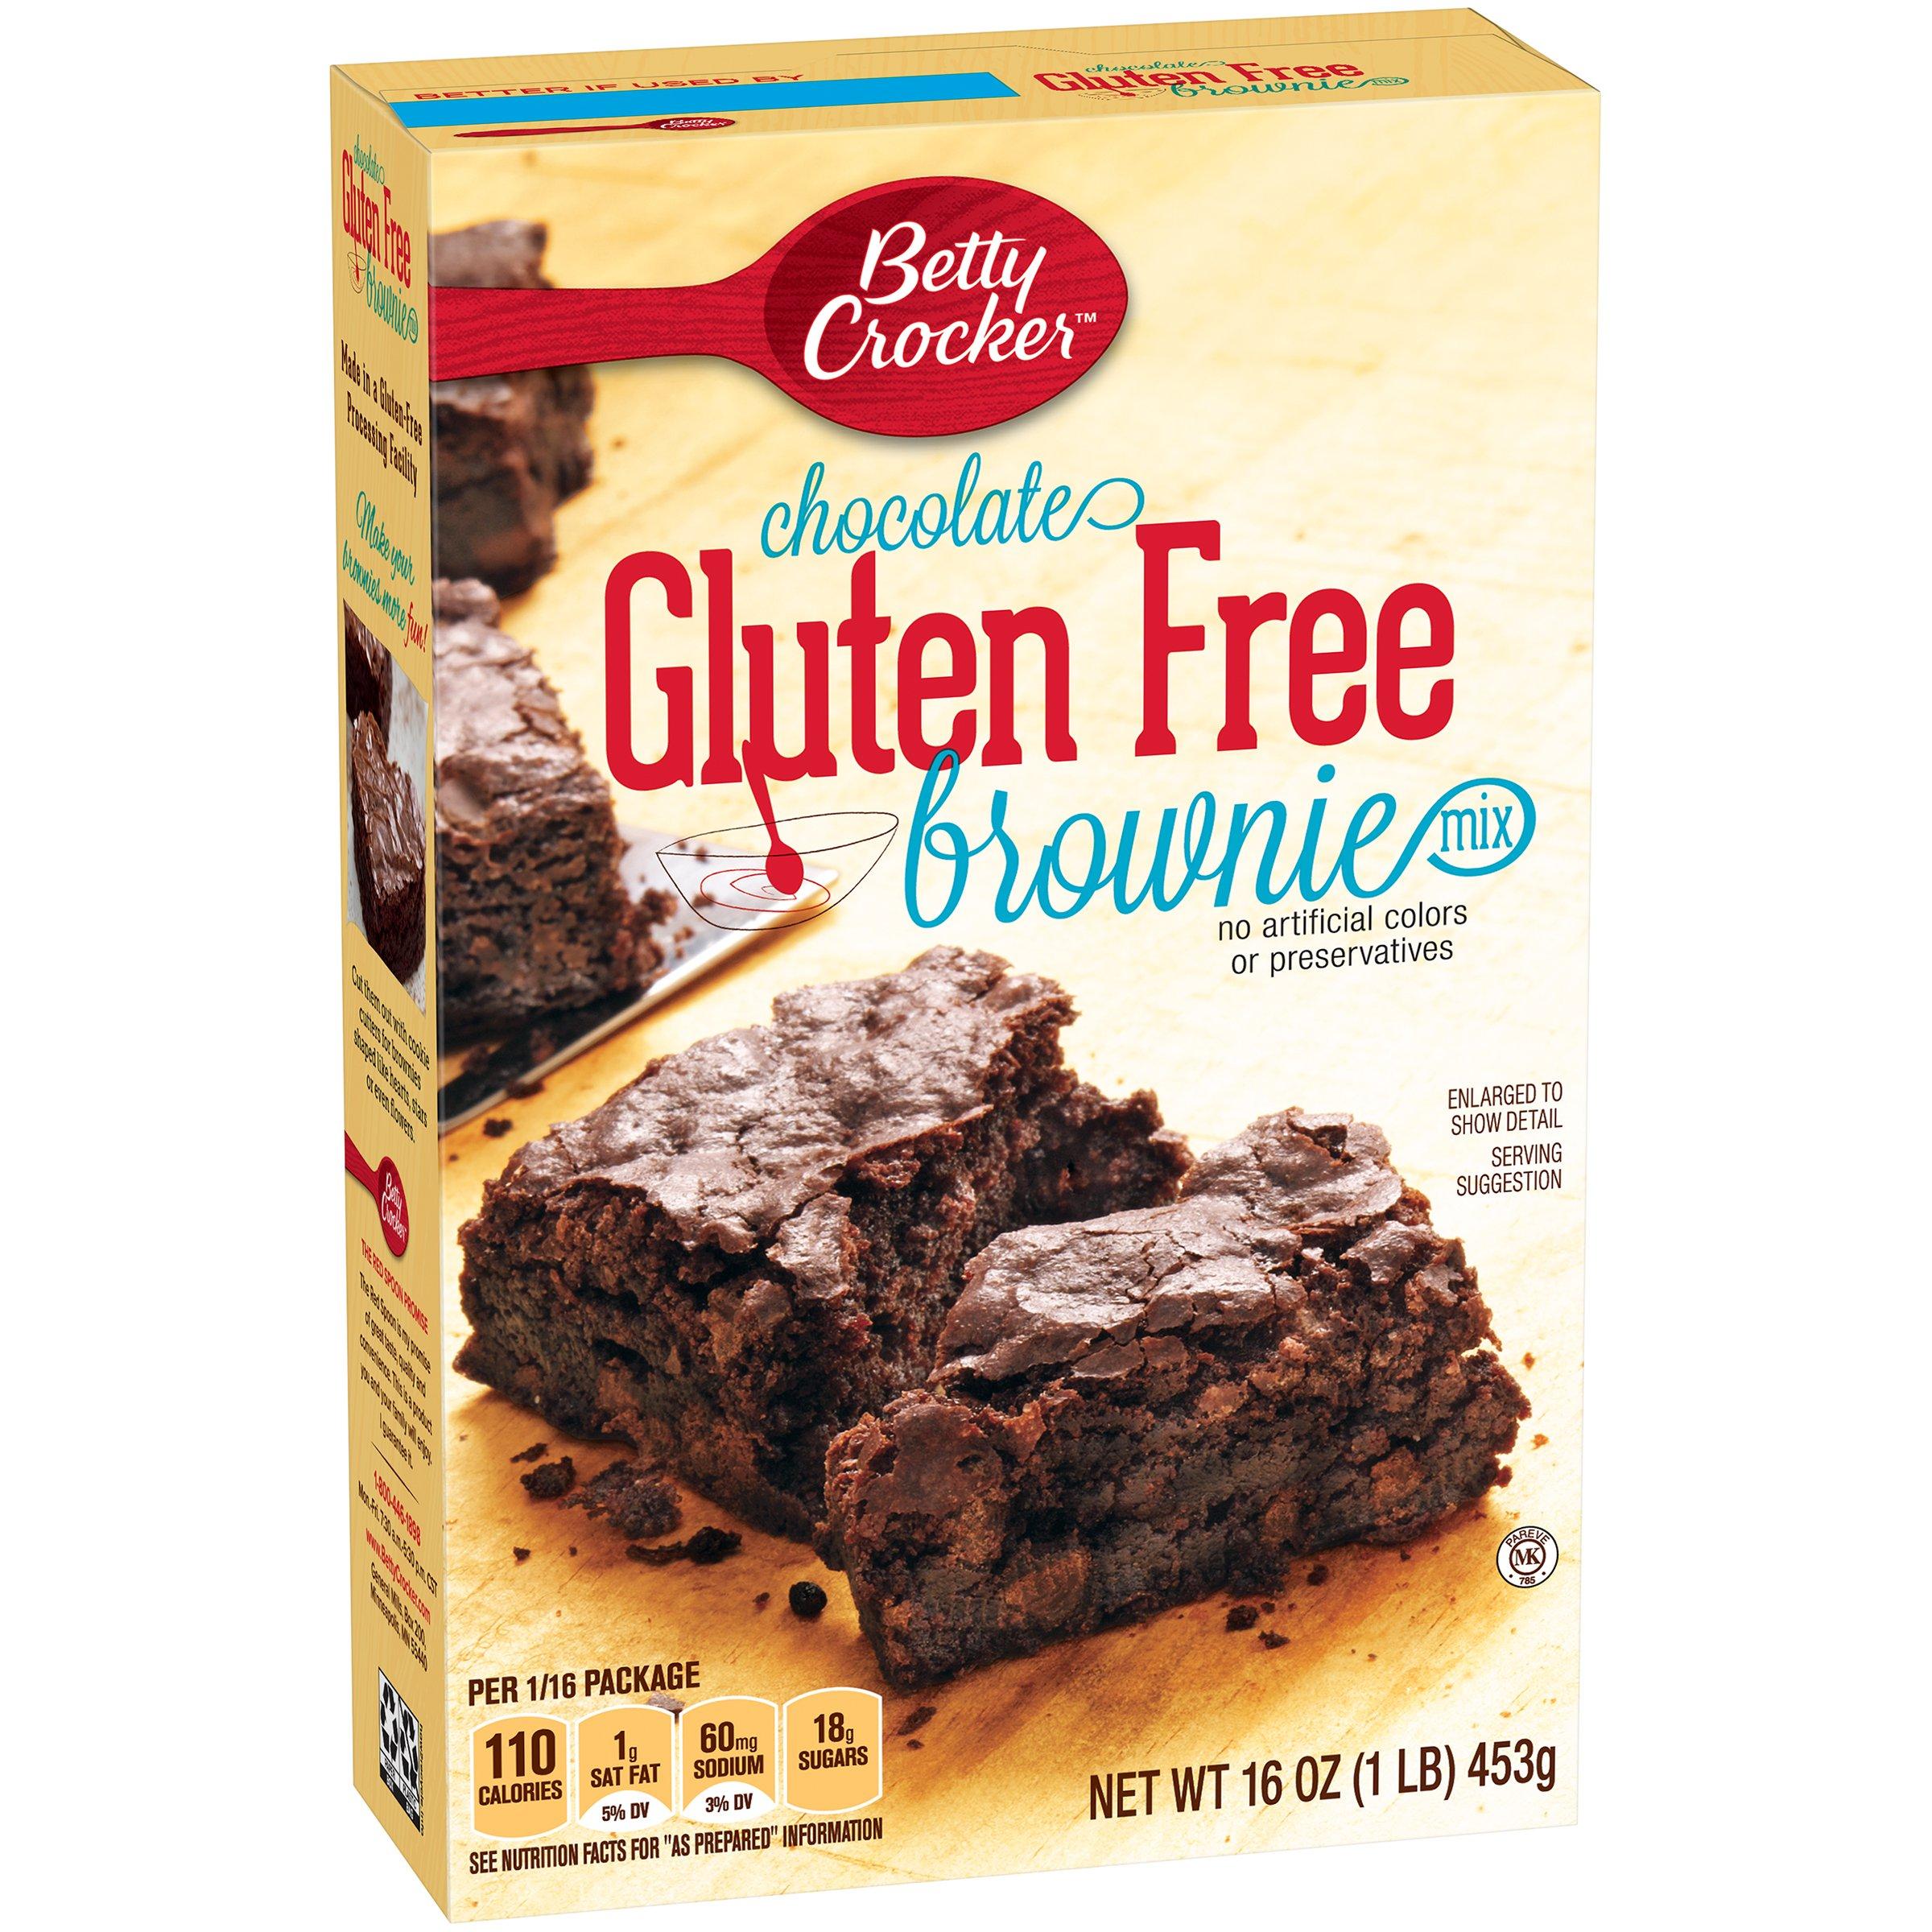 Betty Crocker Baking Mix, Gluten Free Brownie Mix, Chocolate, 16 Oz Box (Pack of 6) by Betty Crocker